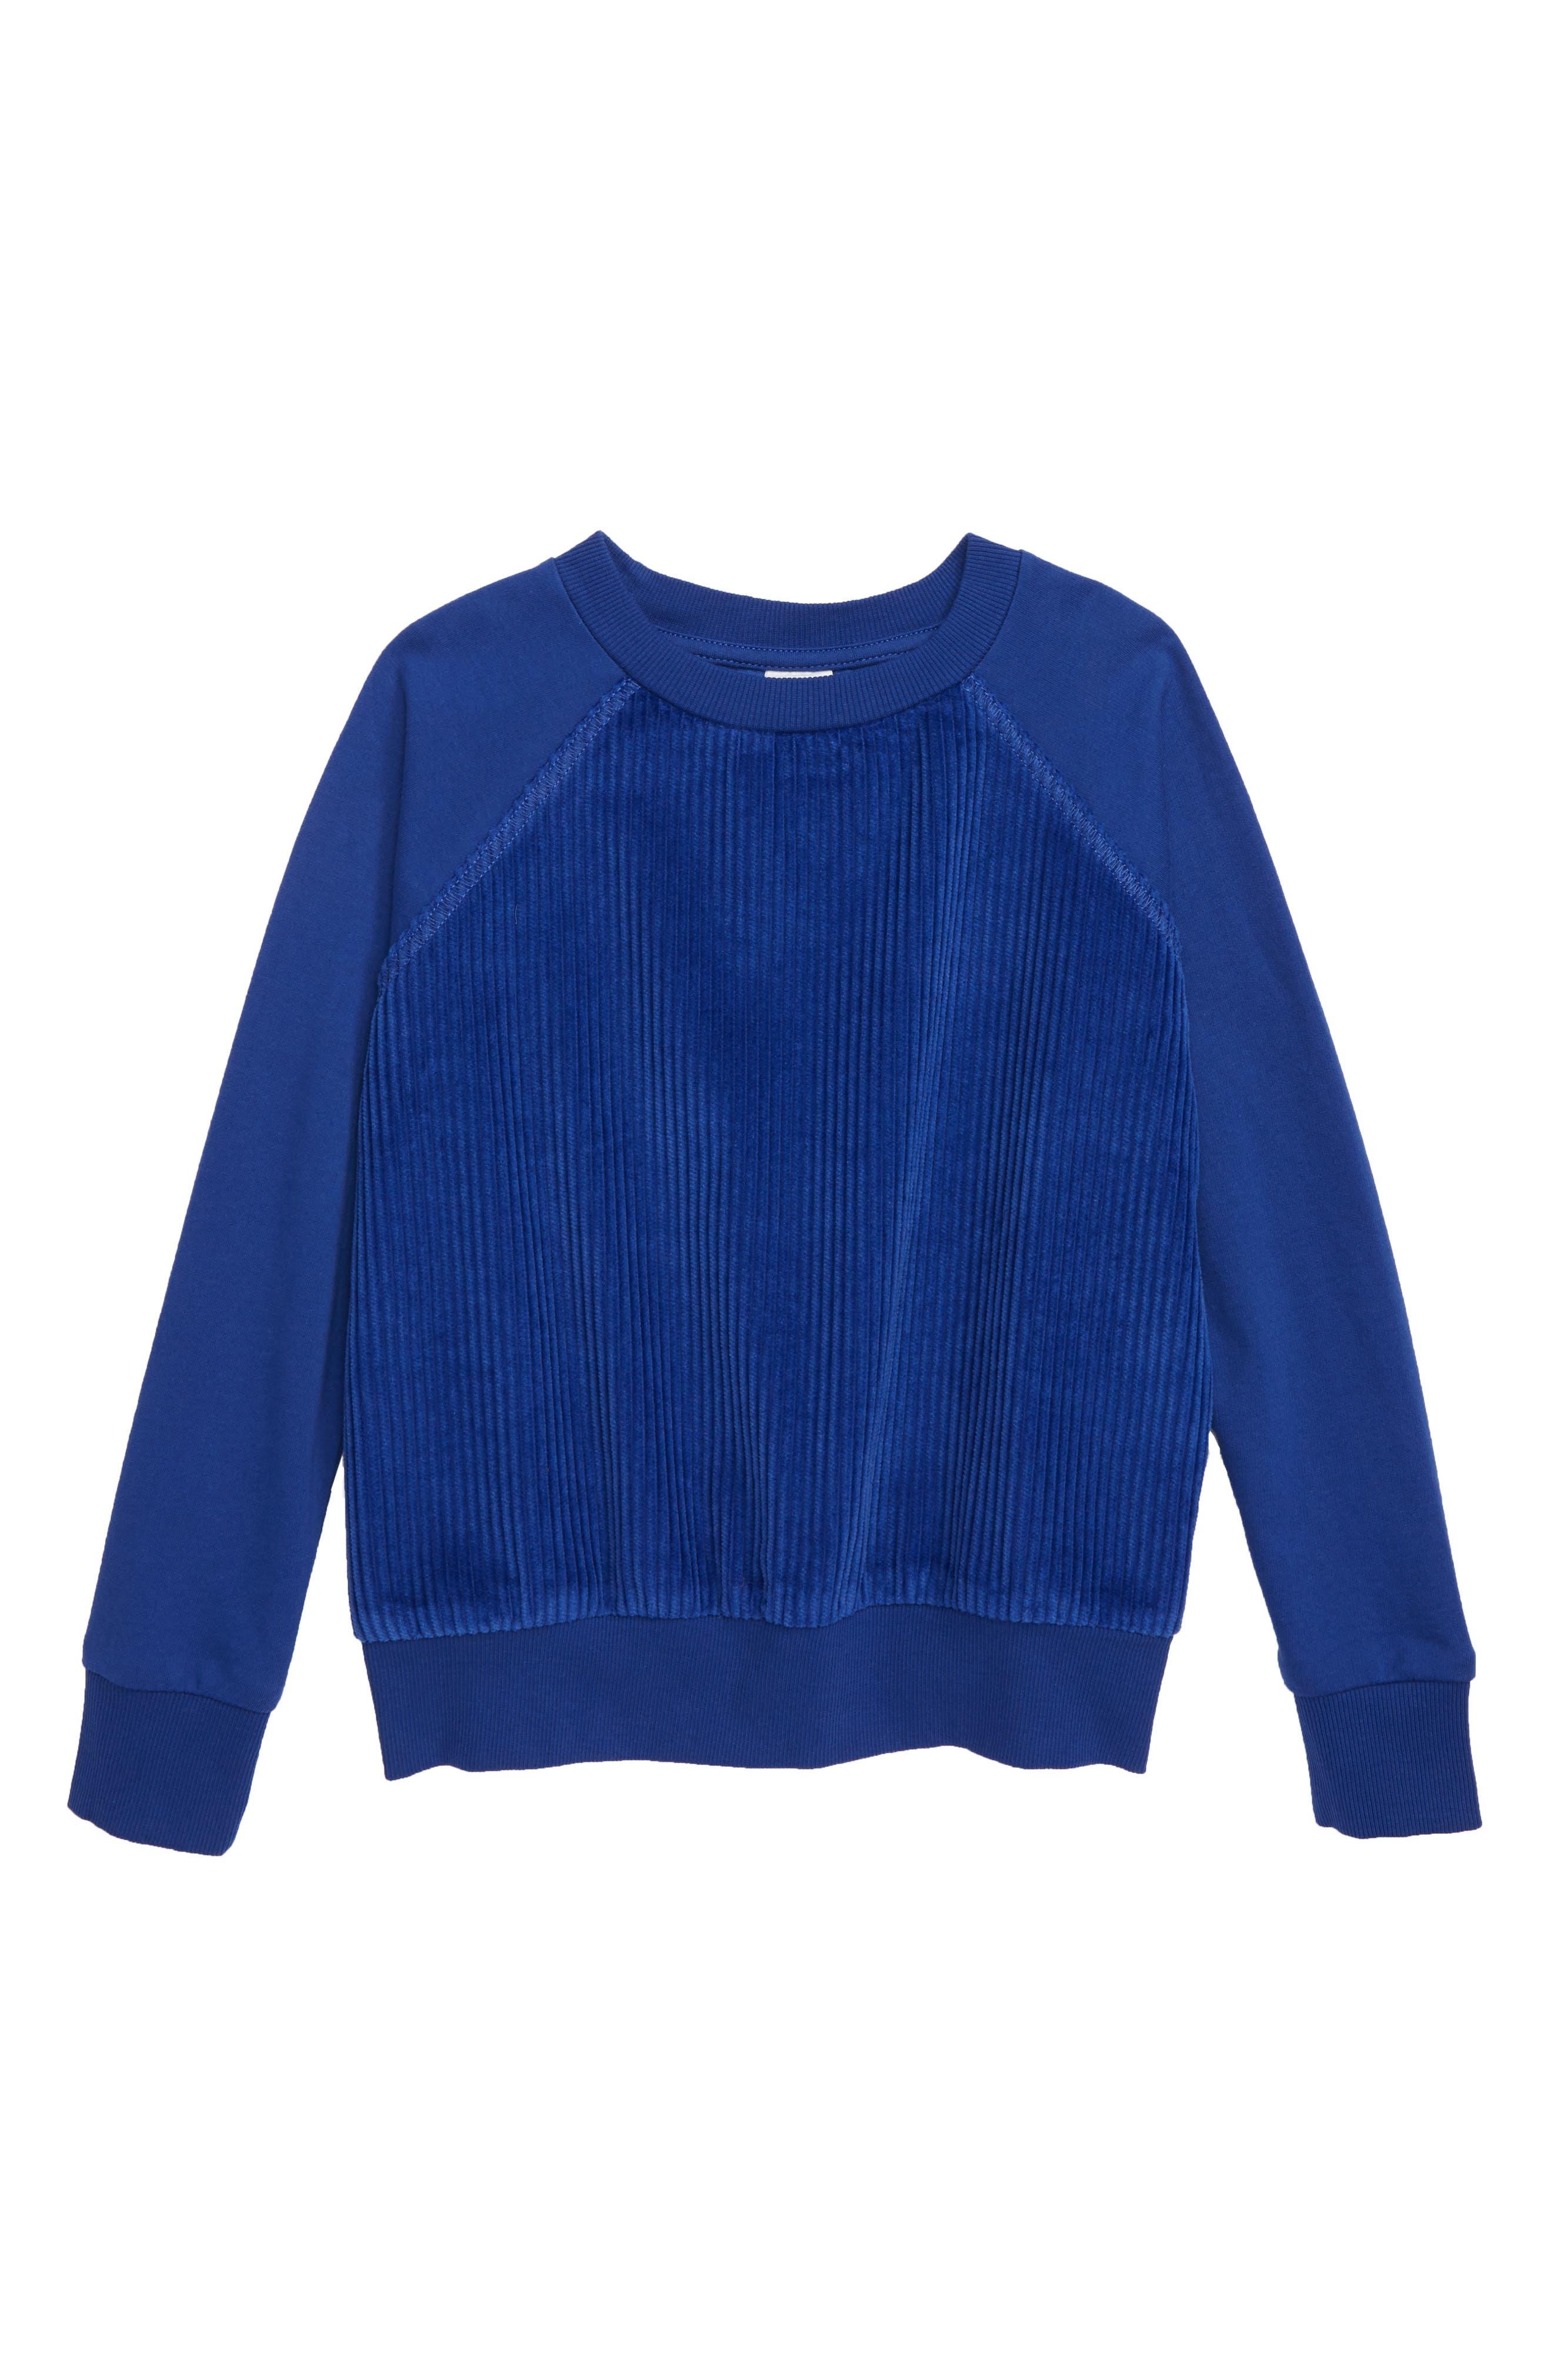 Corduroy Sweatshirt,                             Main thumbnail 1, color,                             401